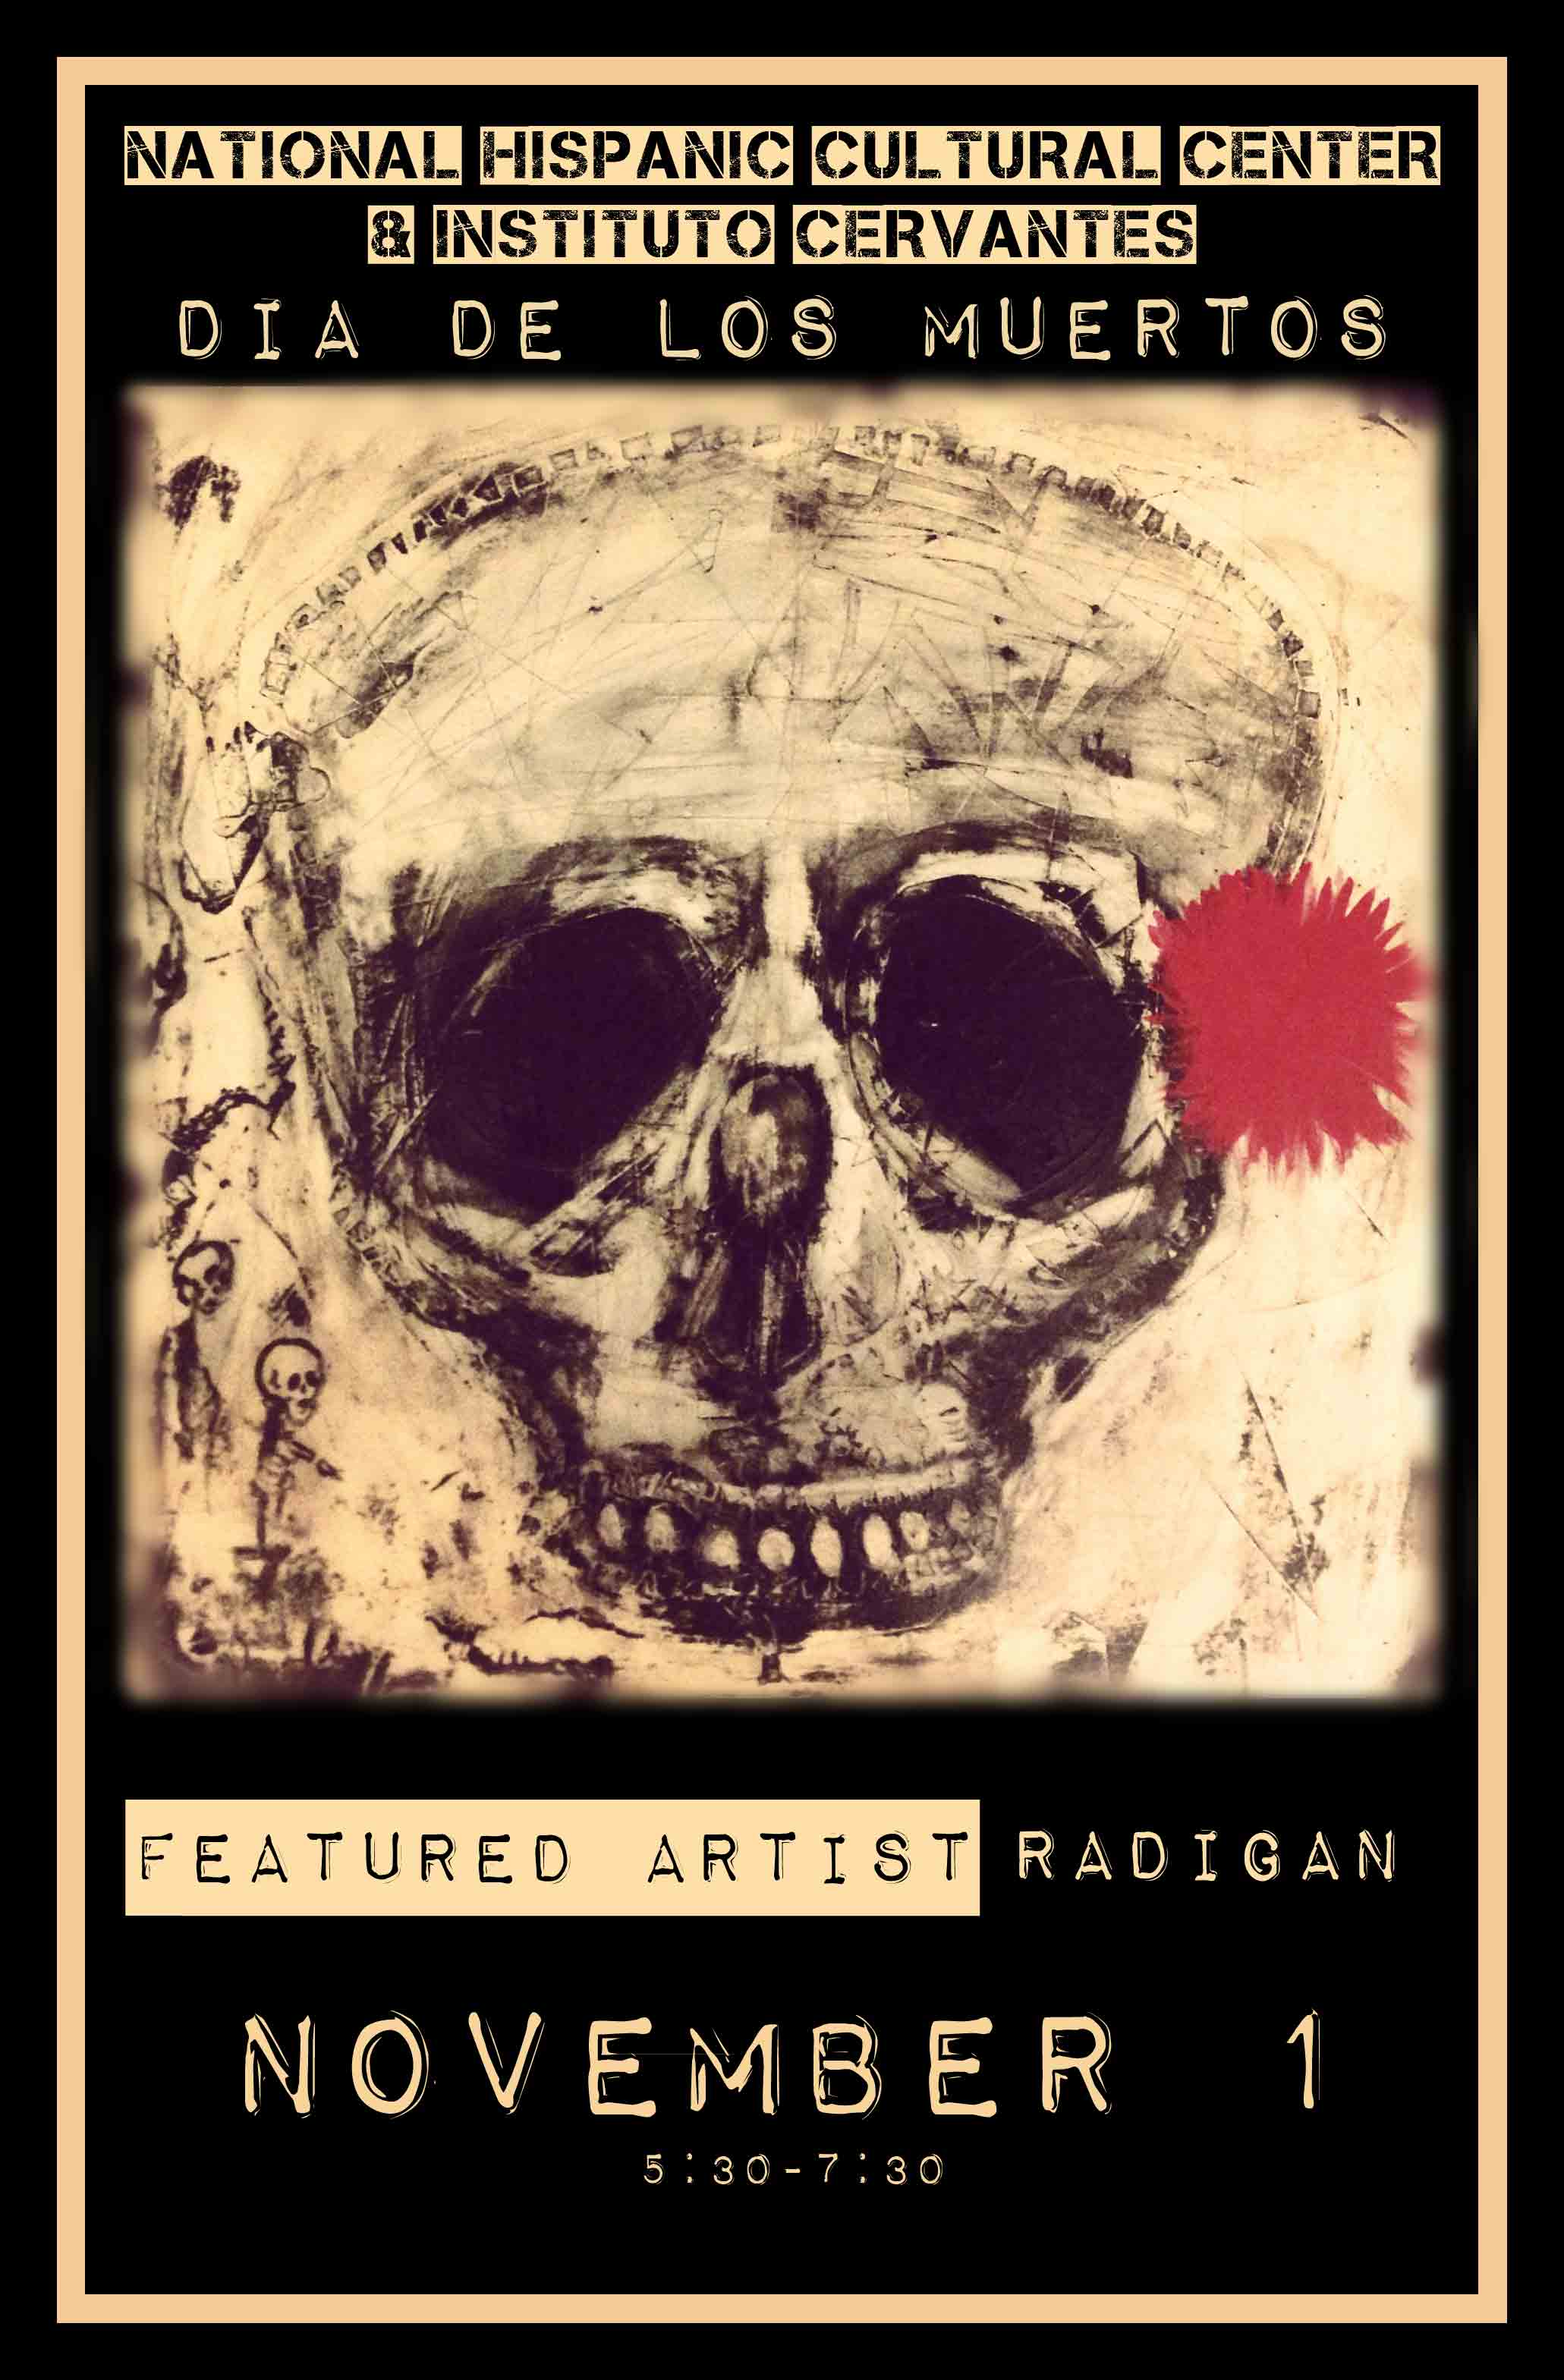 Calavera - Radigan 2013